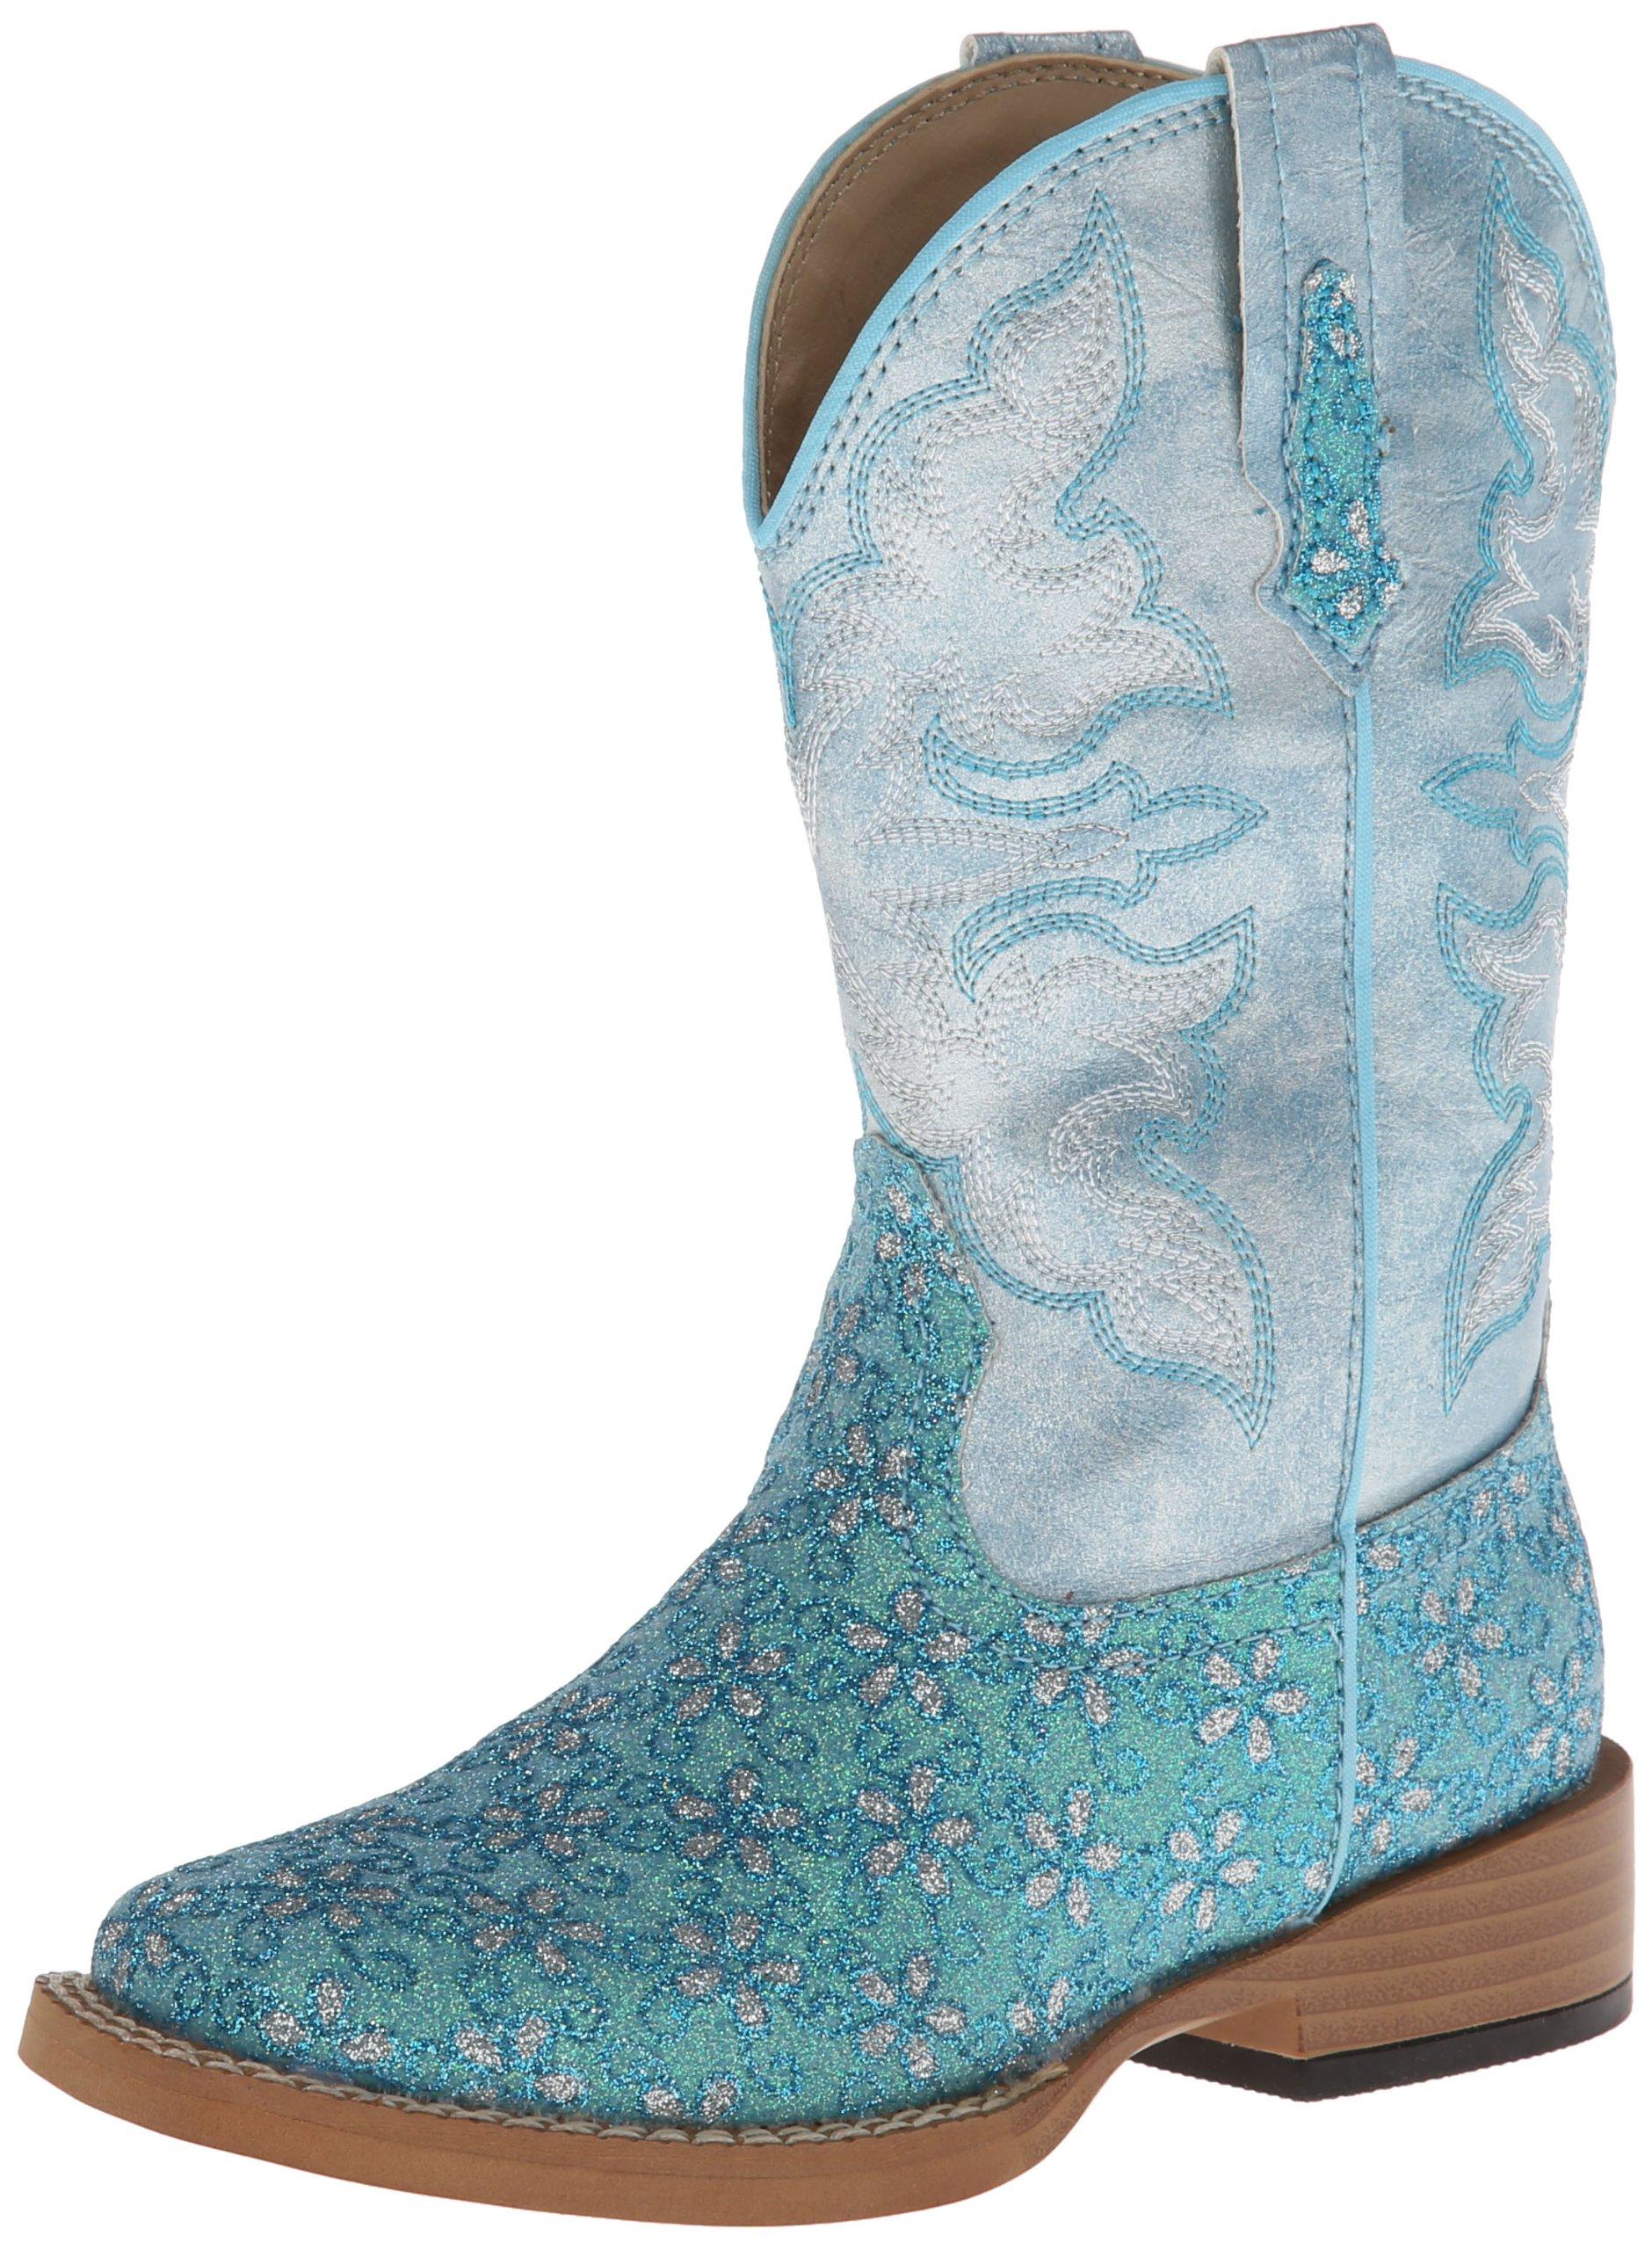 Roper Square Toe Glitter Floral Western Boot (Toddler/Little Kid),Turquoise,3 M US Little Kid